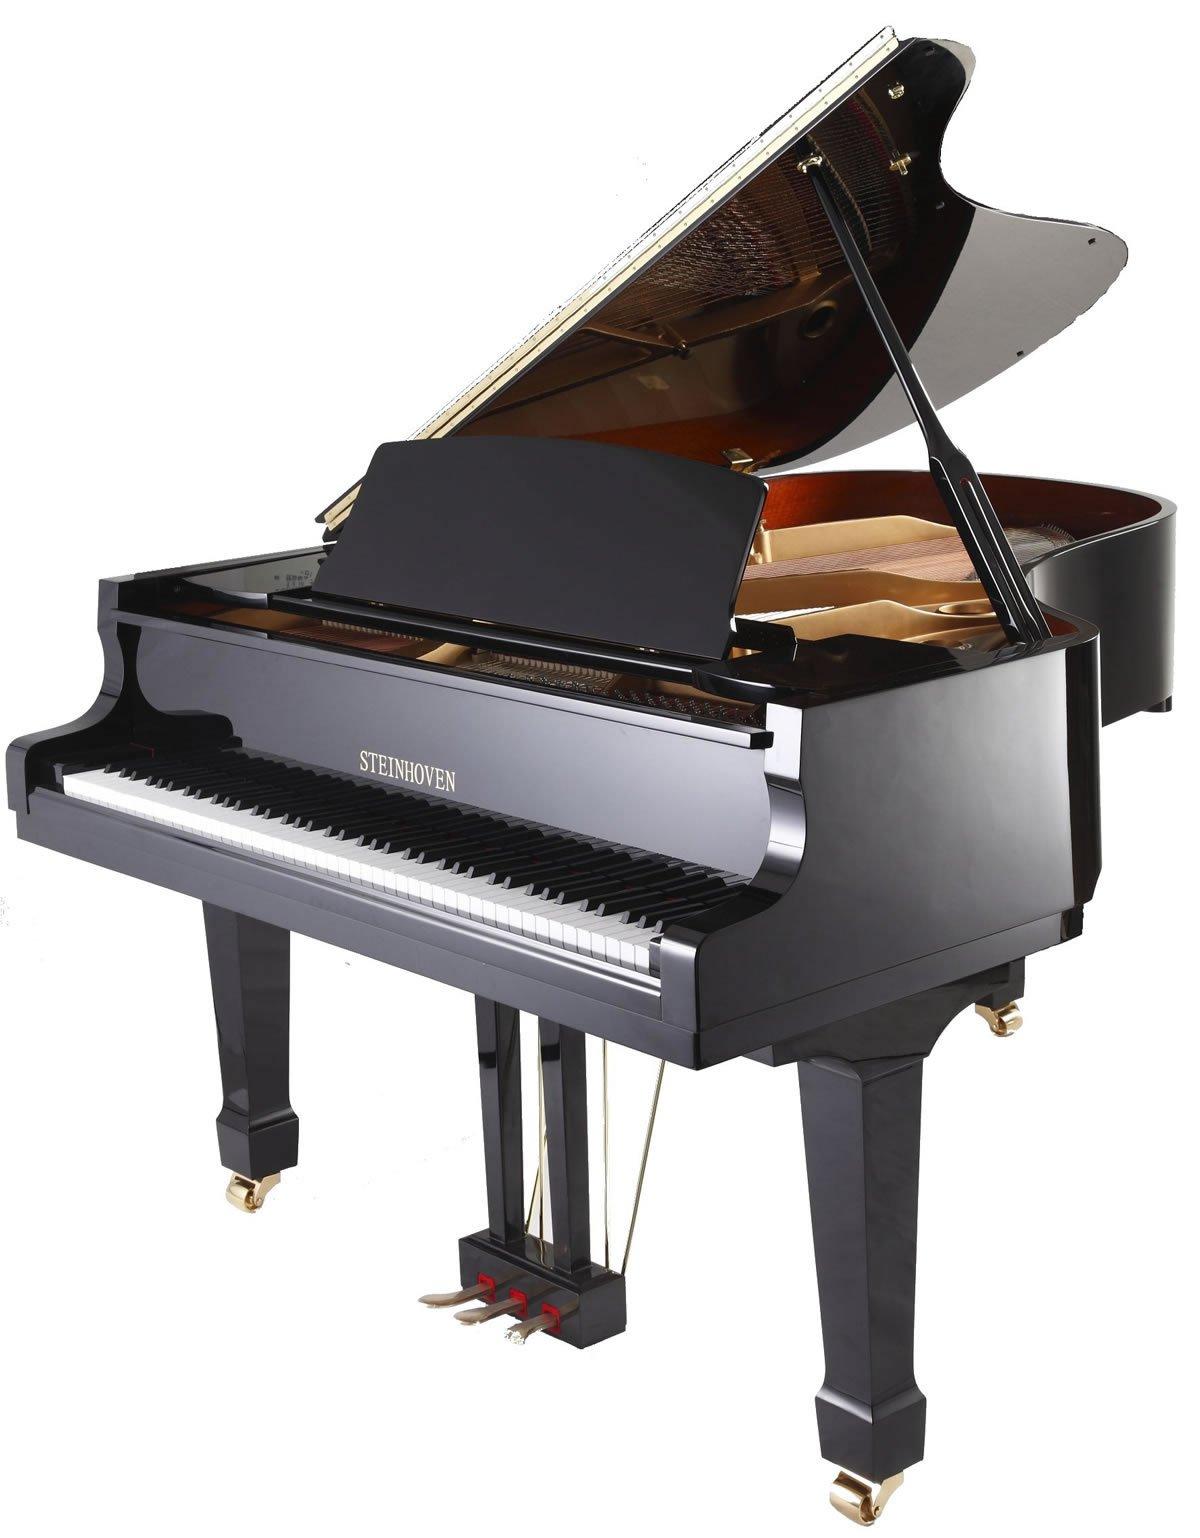 "Steinhoven SG148 Grand Piano, Polished Ebony (148cm, 4'9"") - FREE DELIVERY"